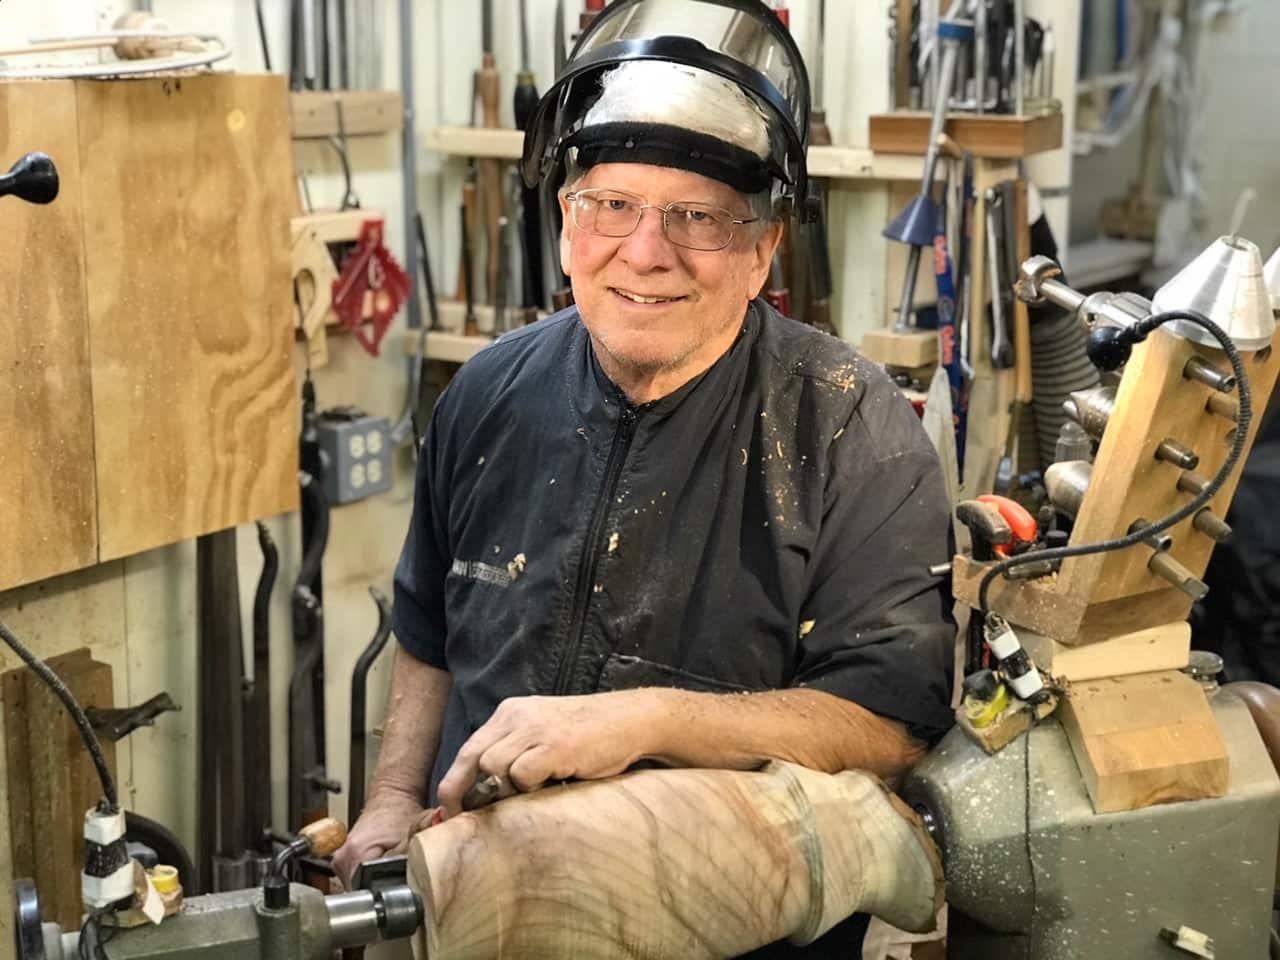 John Williams preparing for art showcase on his woodturning lathe.